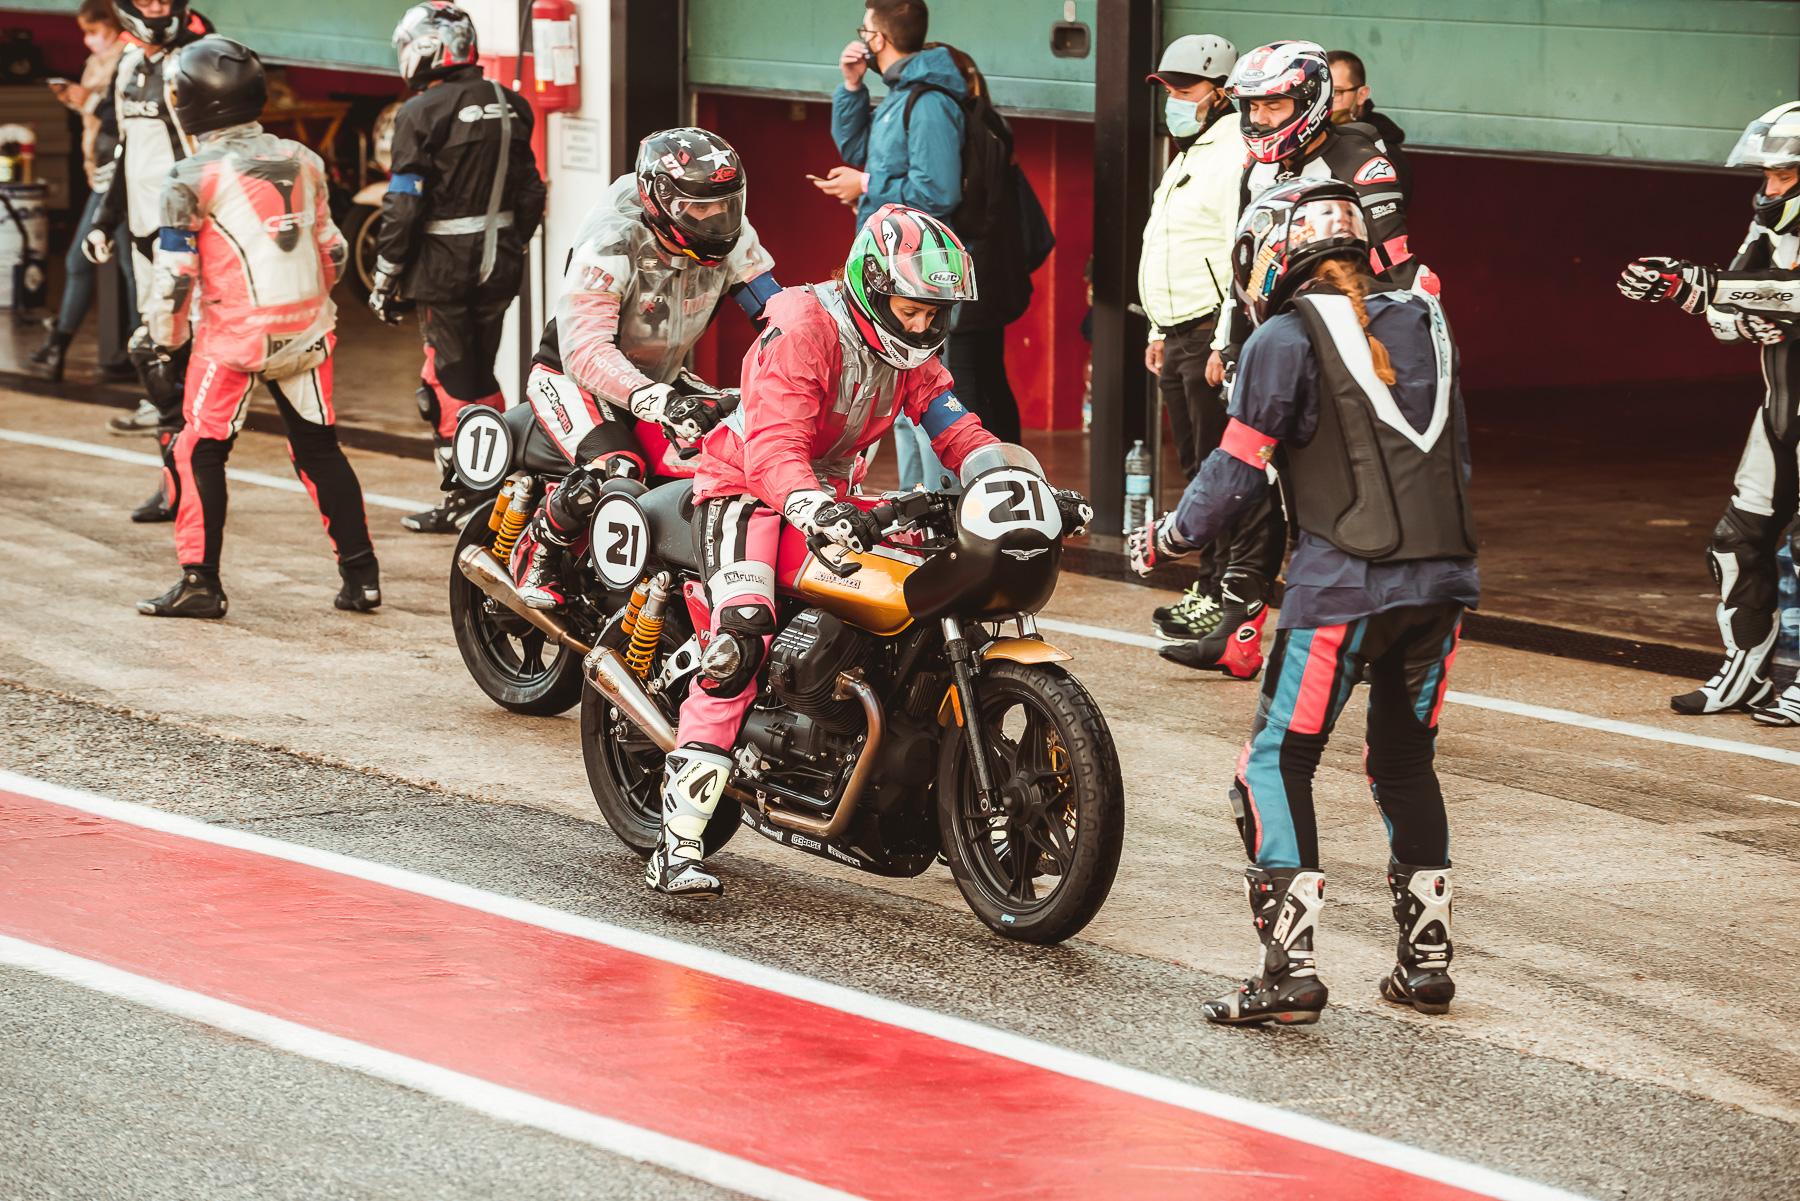 2020-Moto-Guzzi-Endurance-DAY-3-RAIN-11